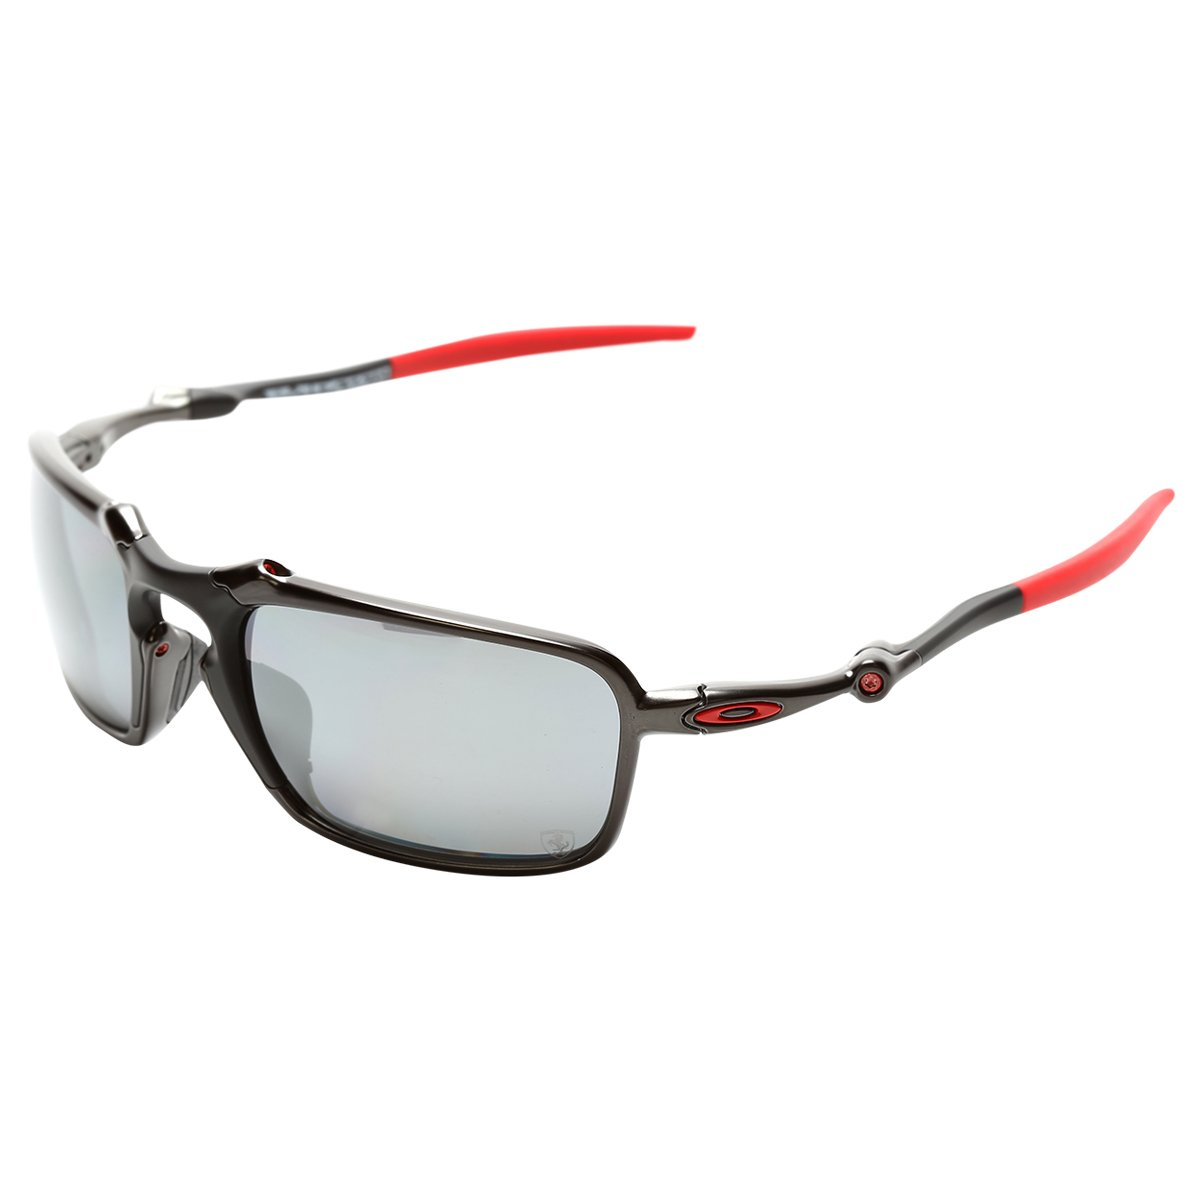 Óculos oakley ferrari badman dark carbon iridium polarizado